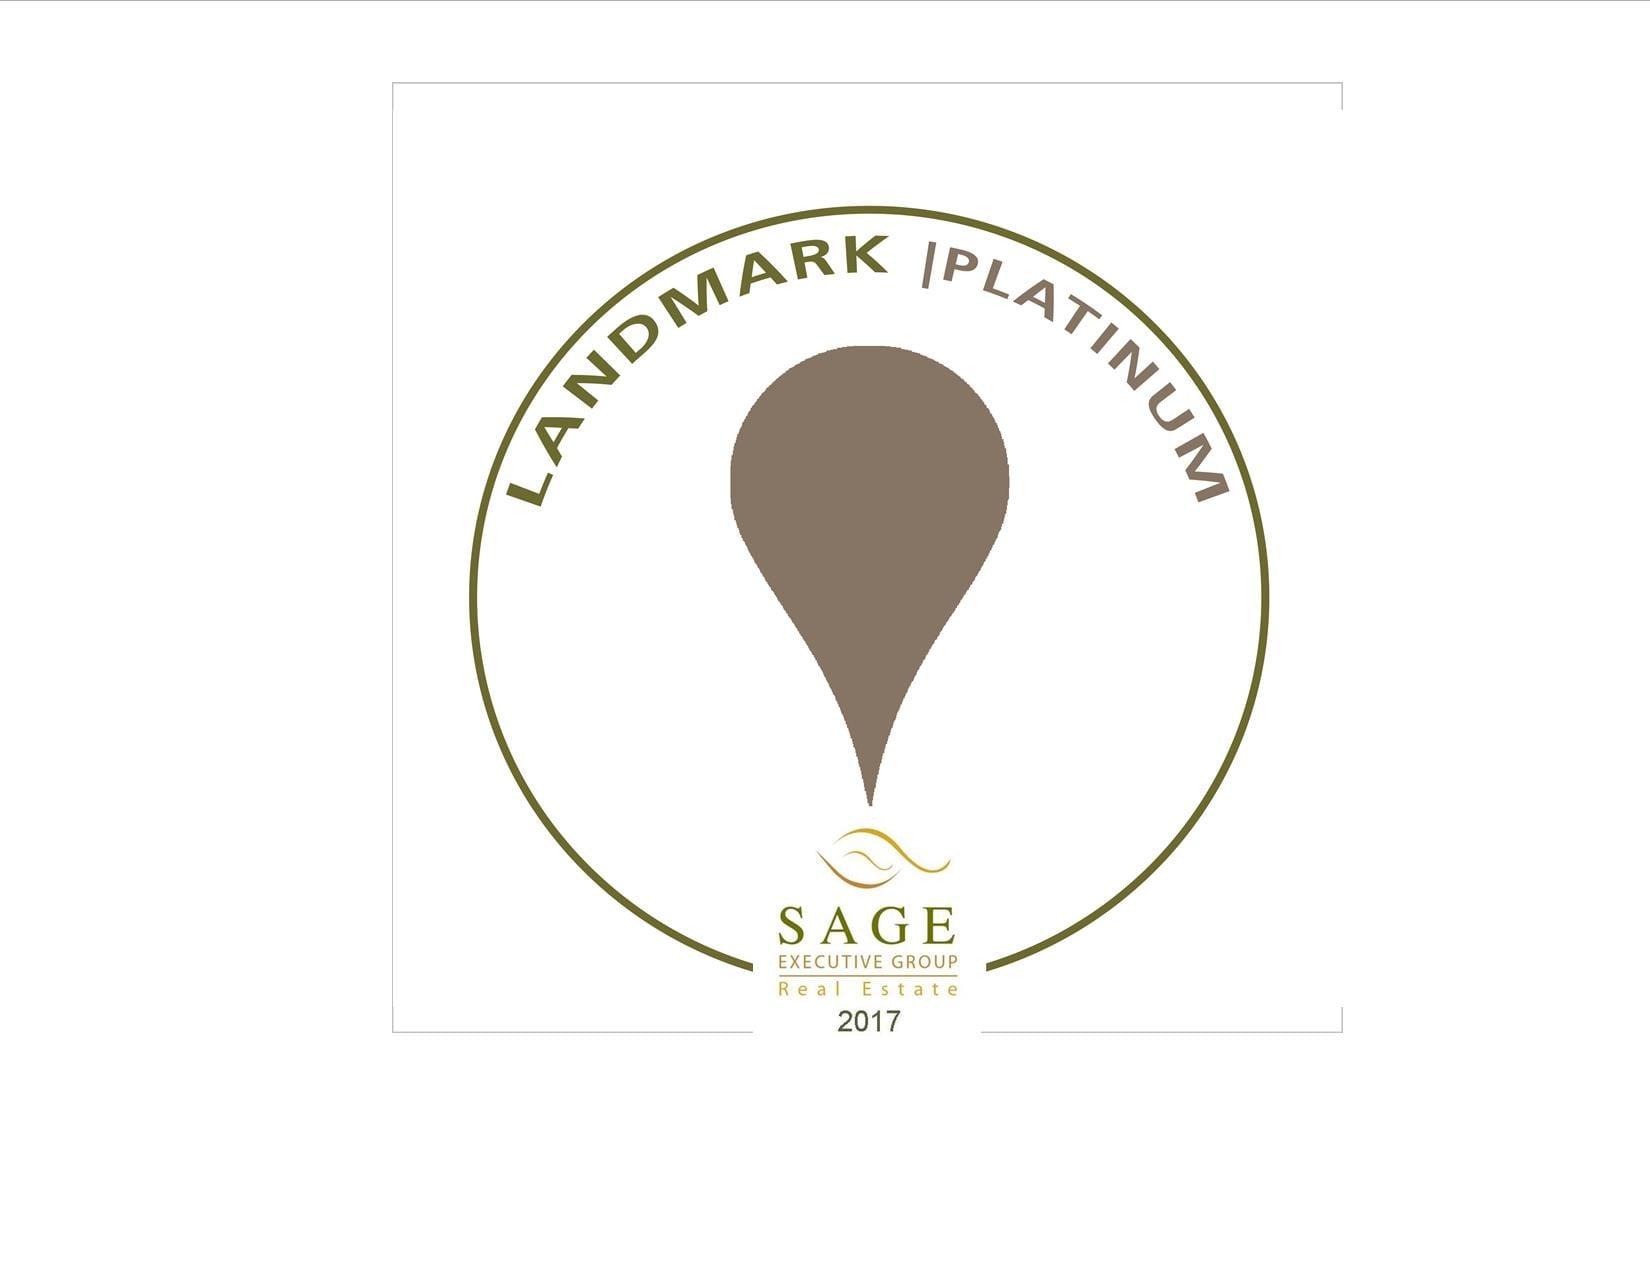 Real Estate Award Landmark Platinum 2017